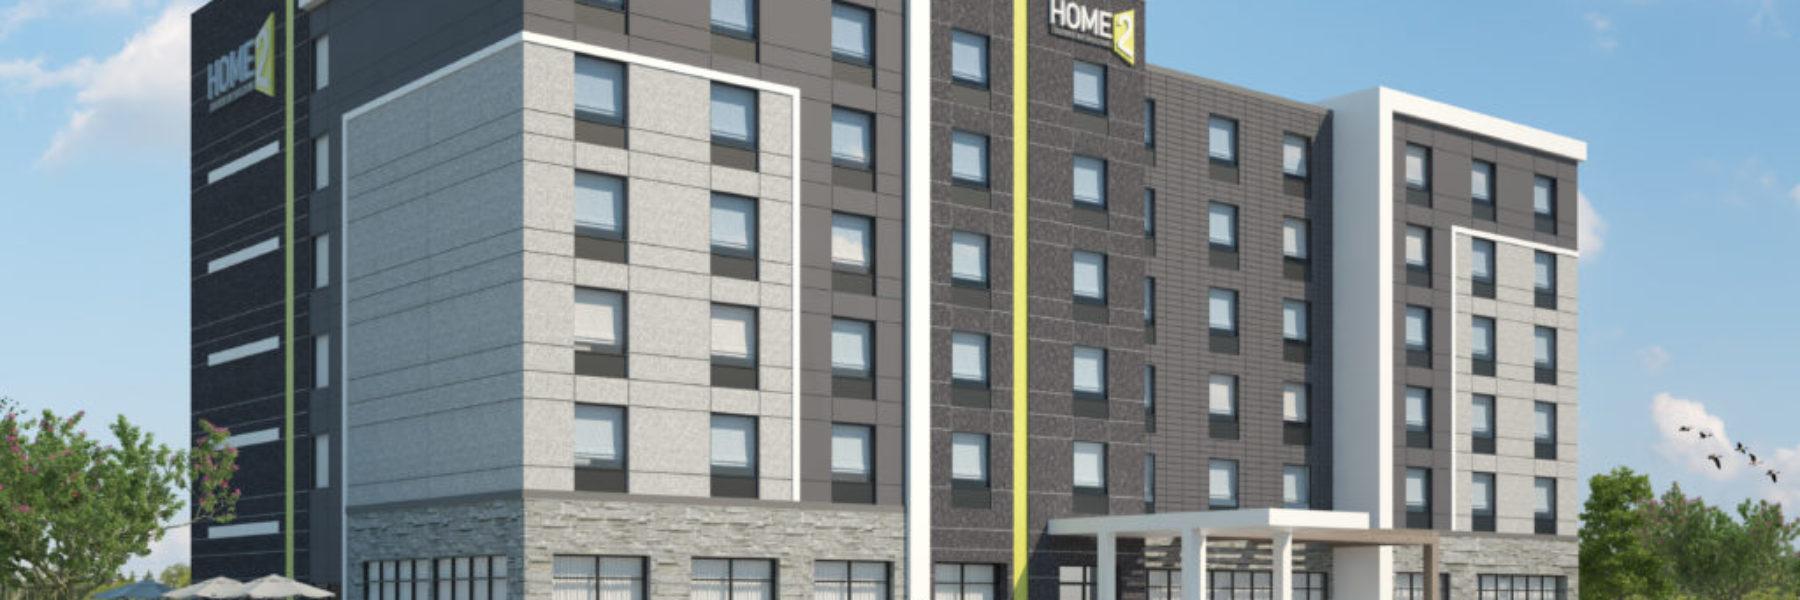 Thunder Bay Home2 Hotel Render Update 19-06-03 (18-029)